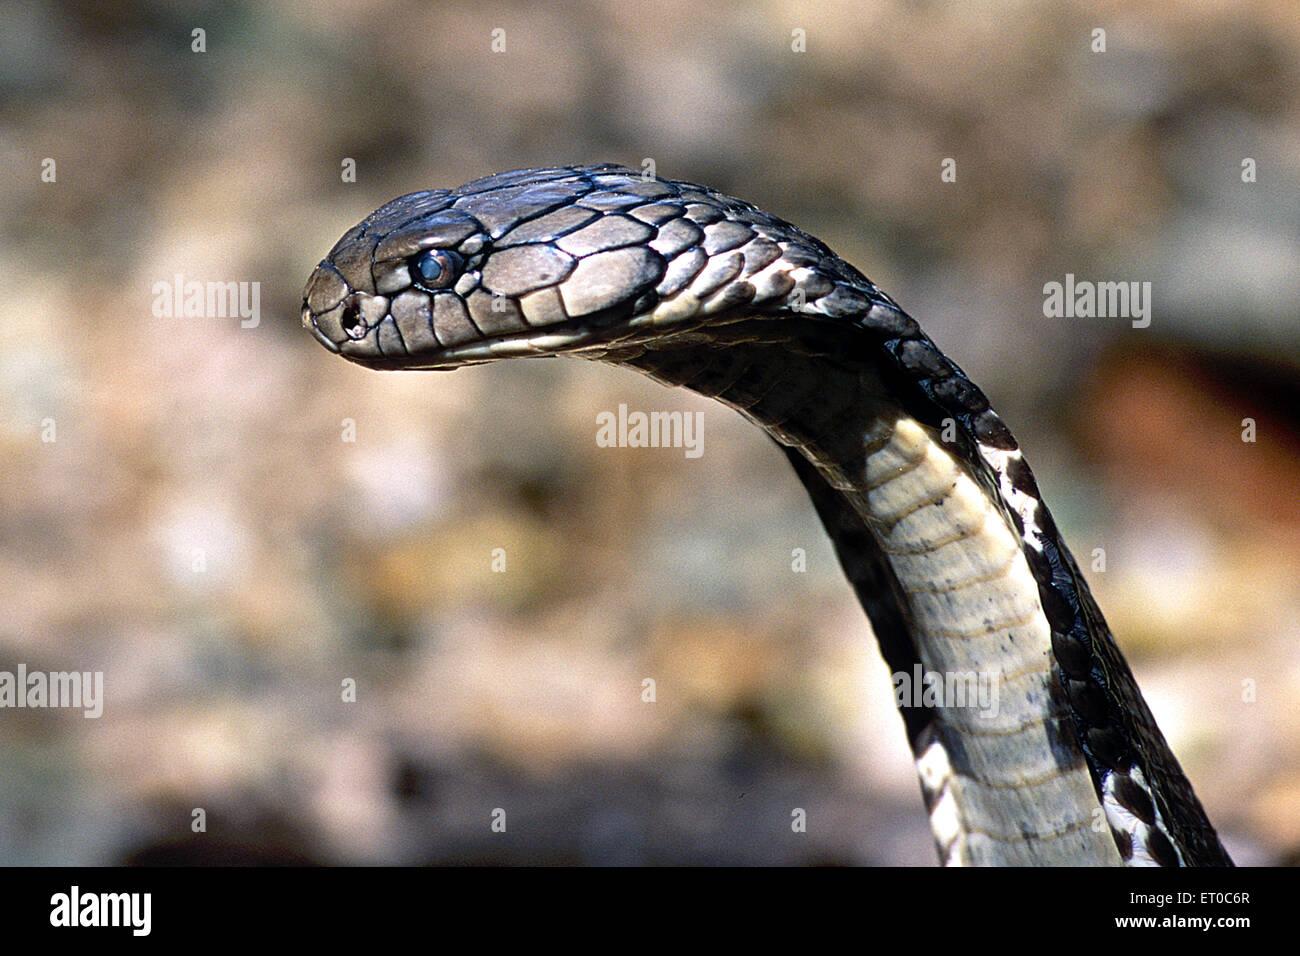 Reptiles ; King cobra ophiophagus hannah longest venomous snake eater ; Karnataka ; India - Stock Image